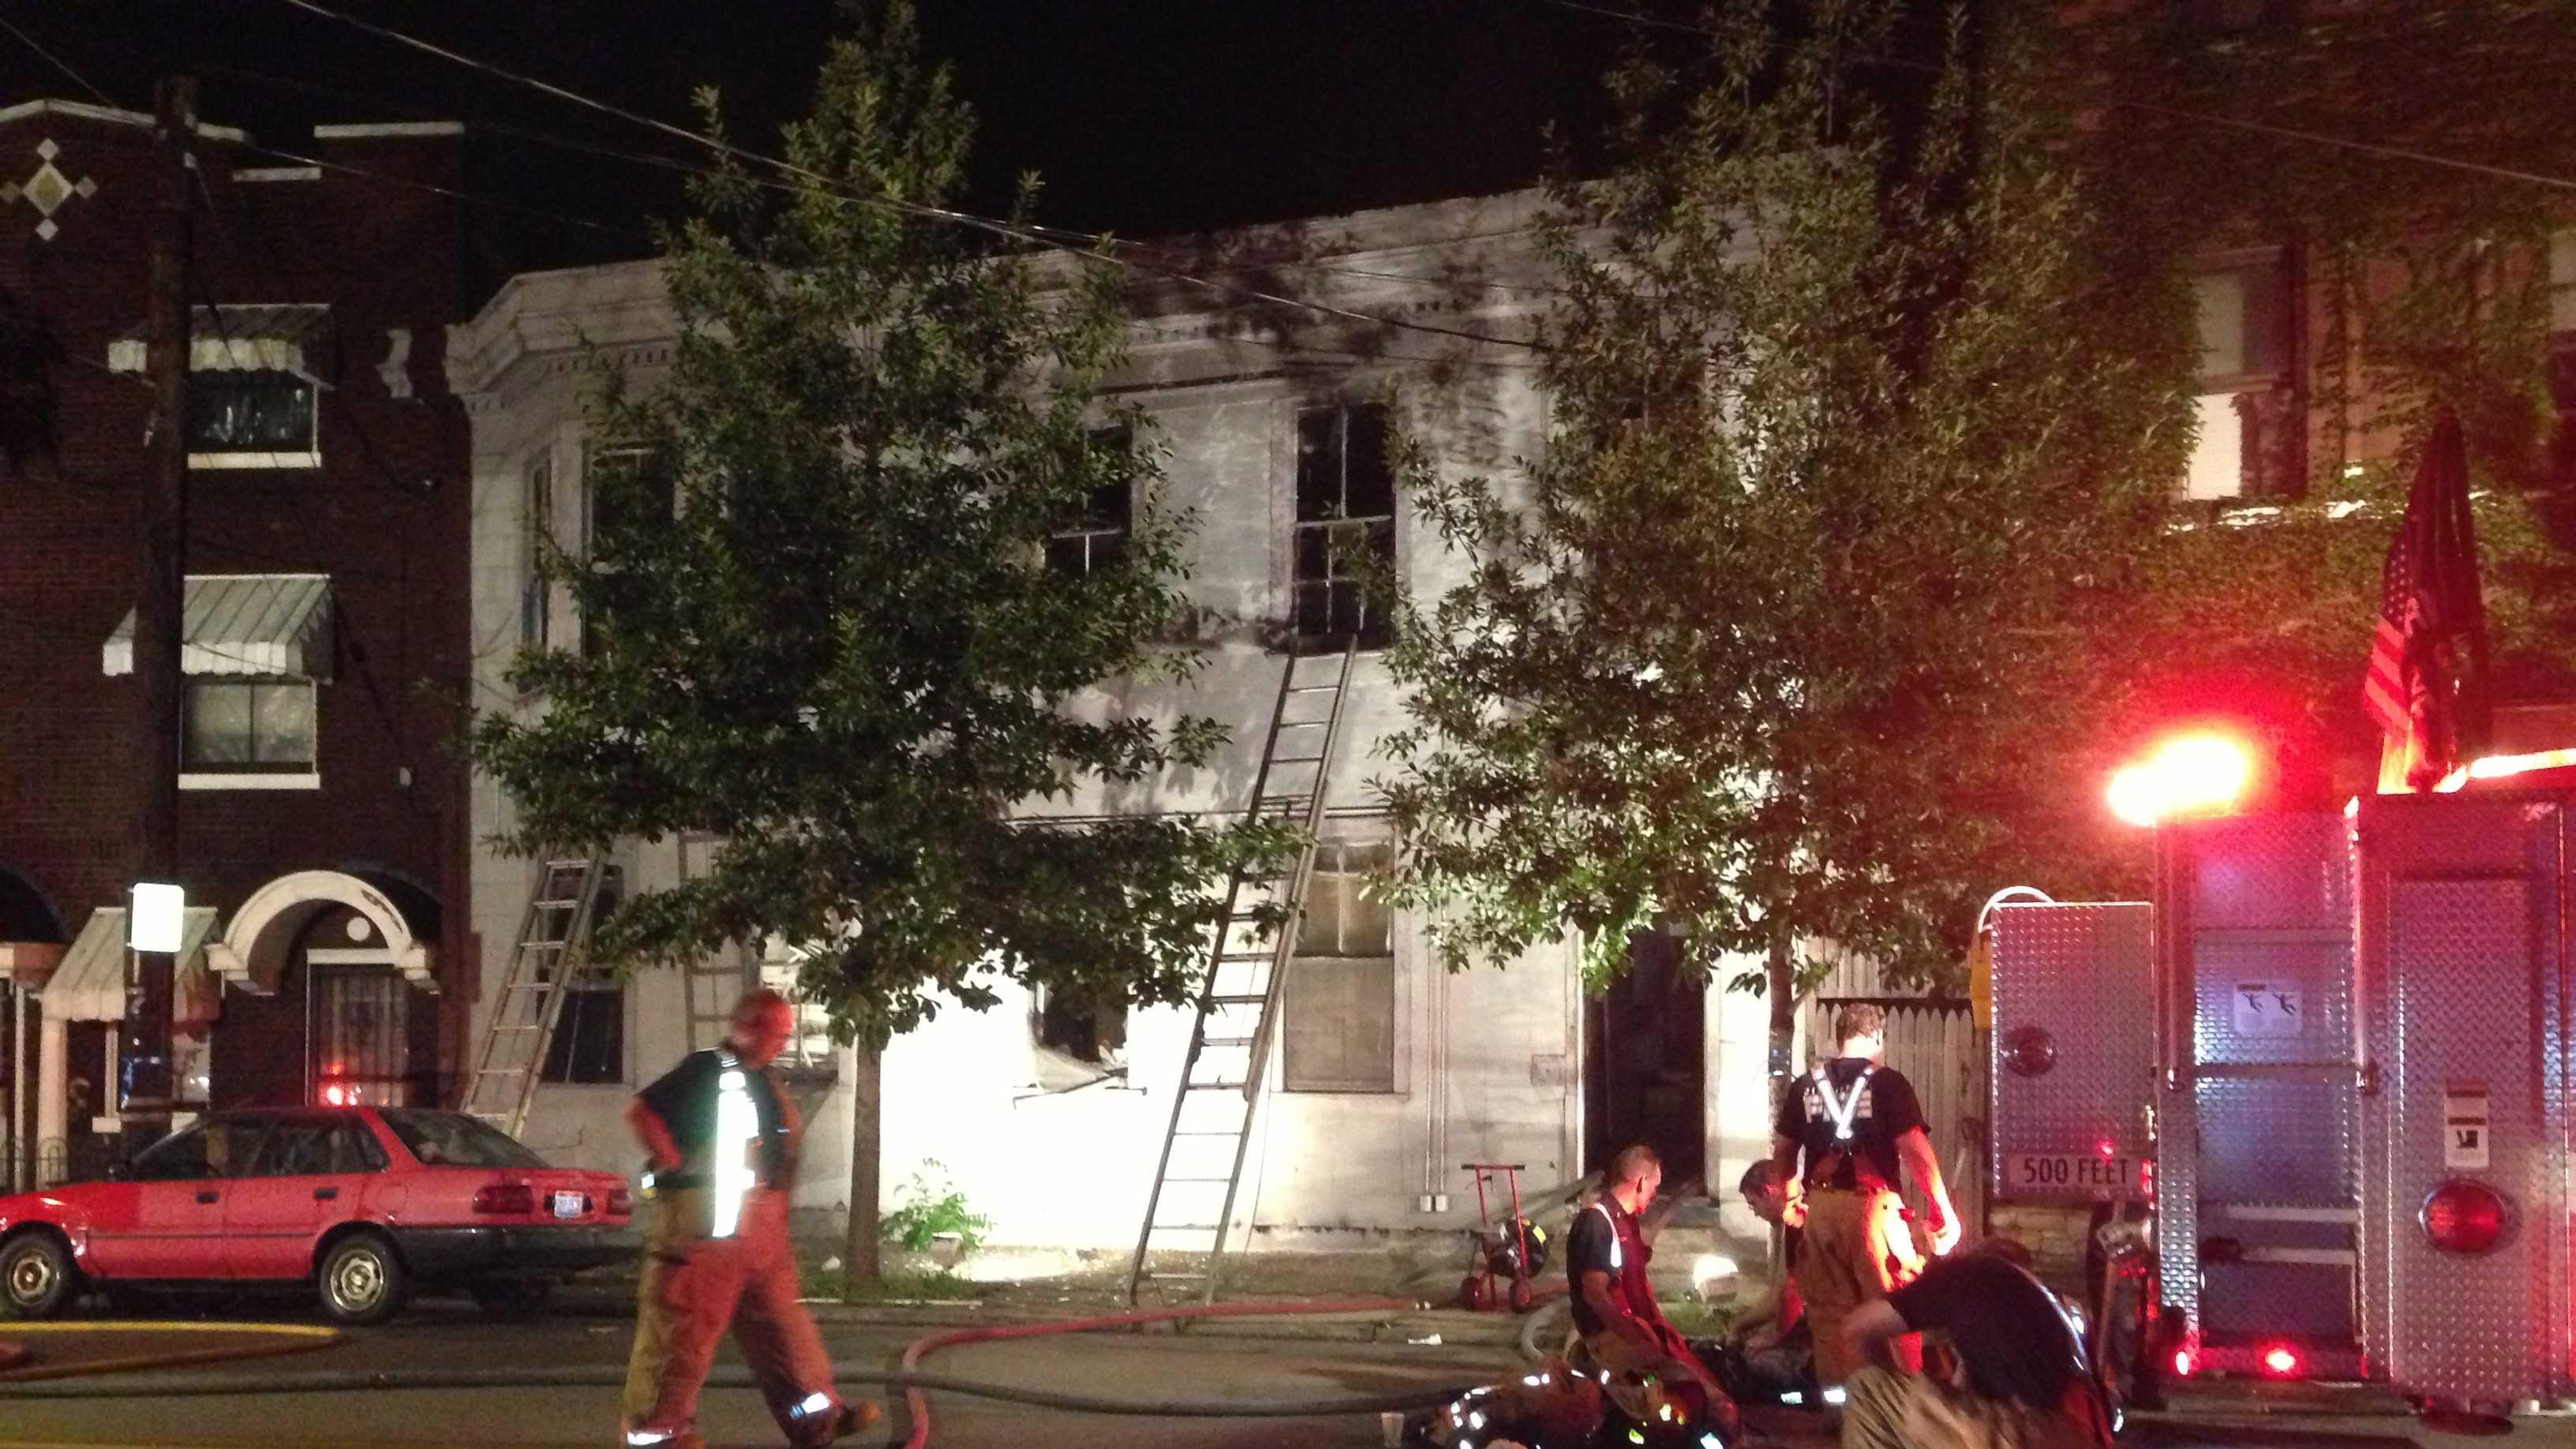 Crews battle fire on West McMicken Avenue